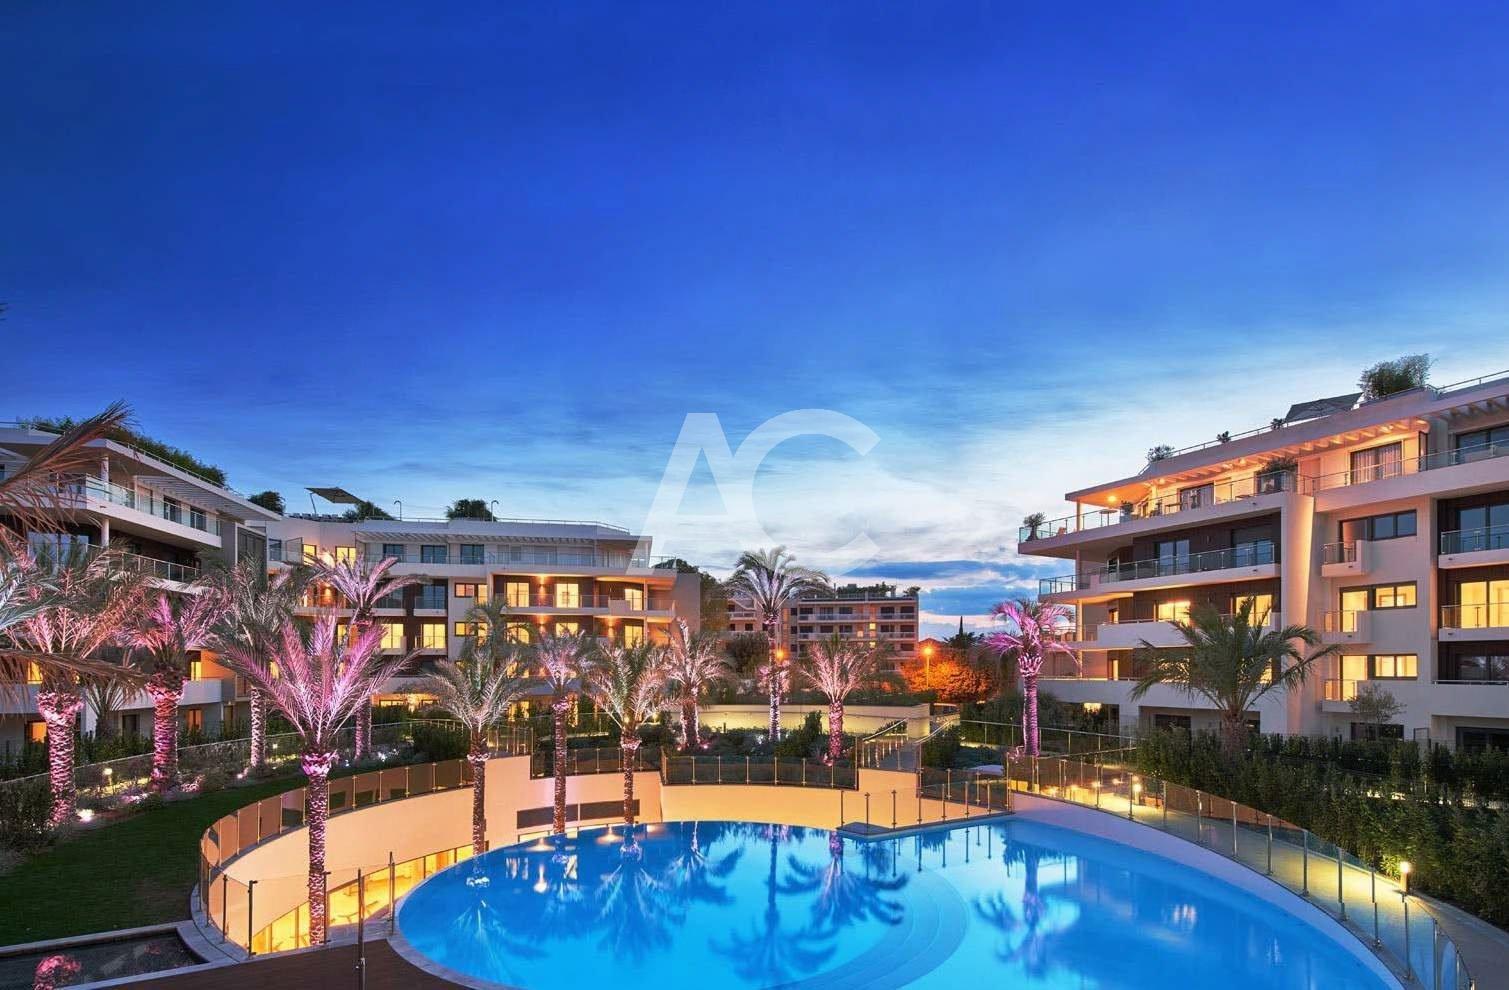 Luxury apartment - Cap d'Antibes - Near the beach